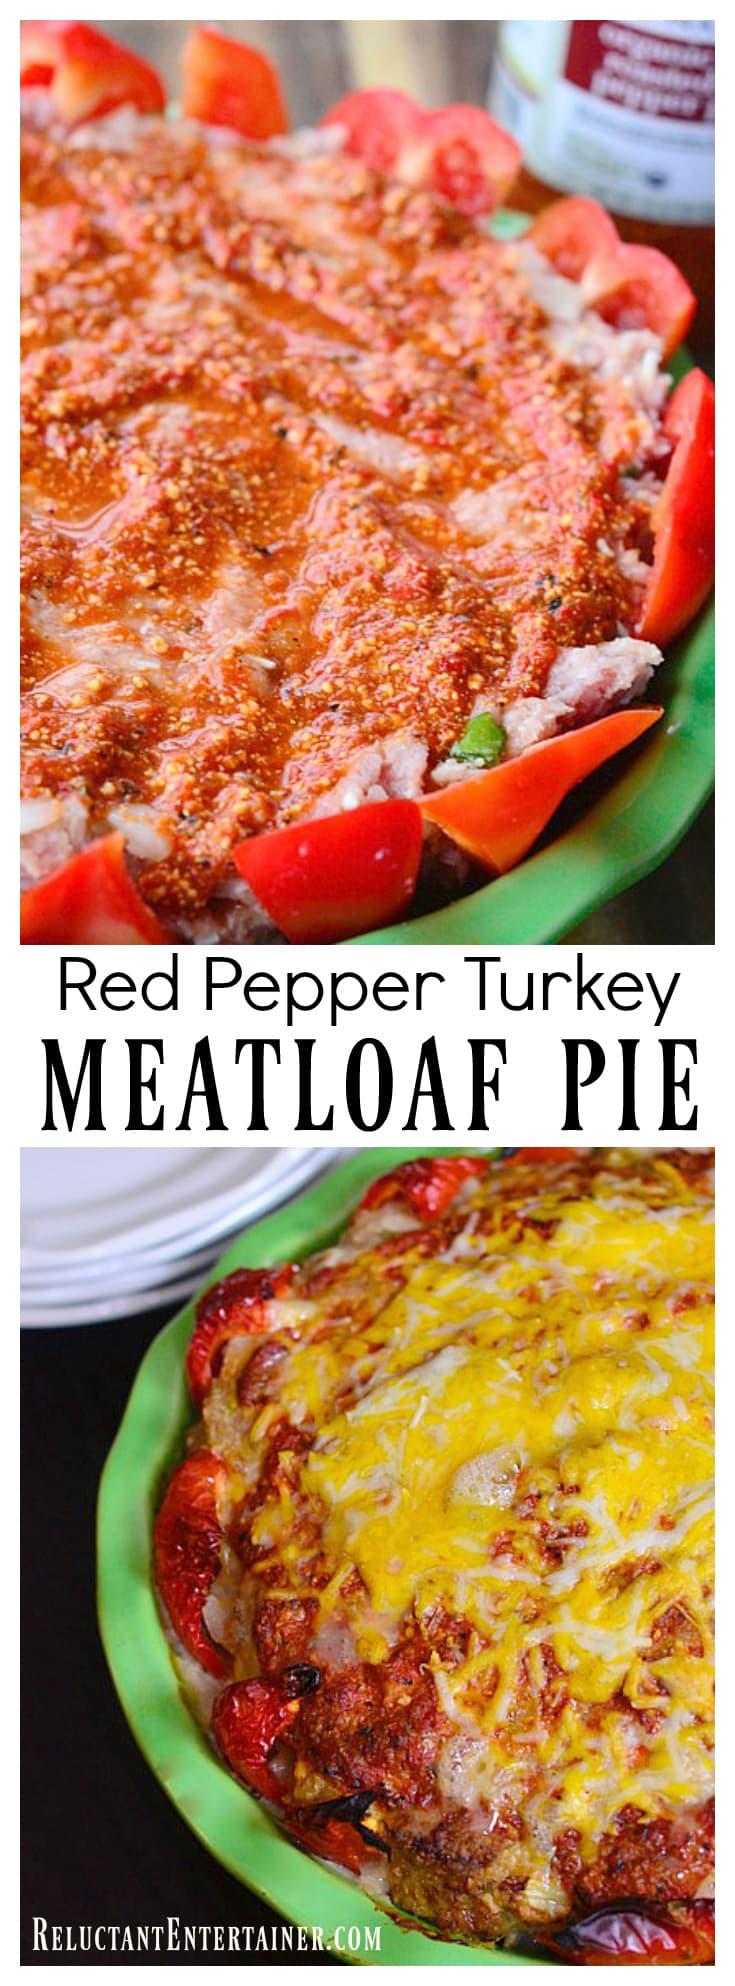 Red Pepper Turkey Meatloaf Pie